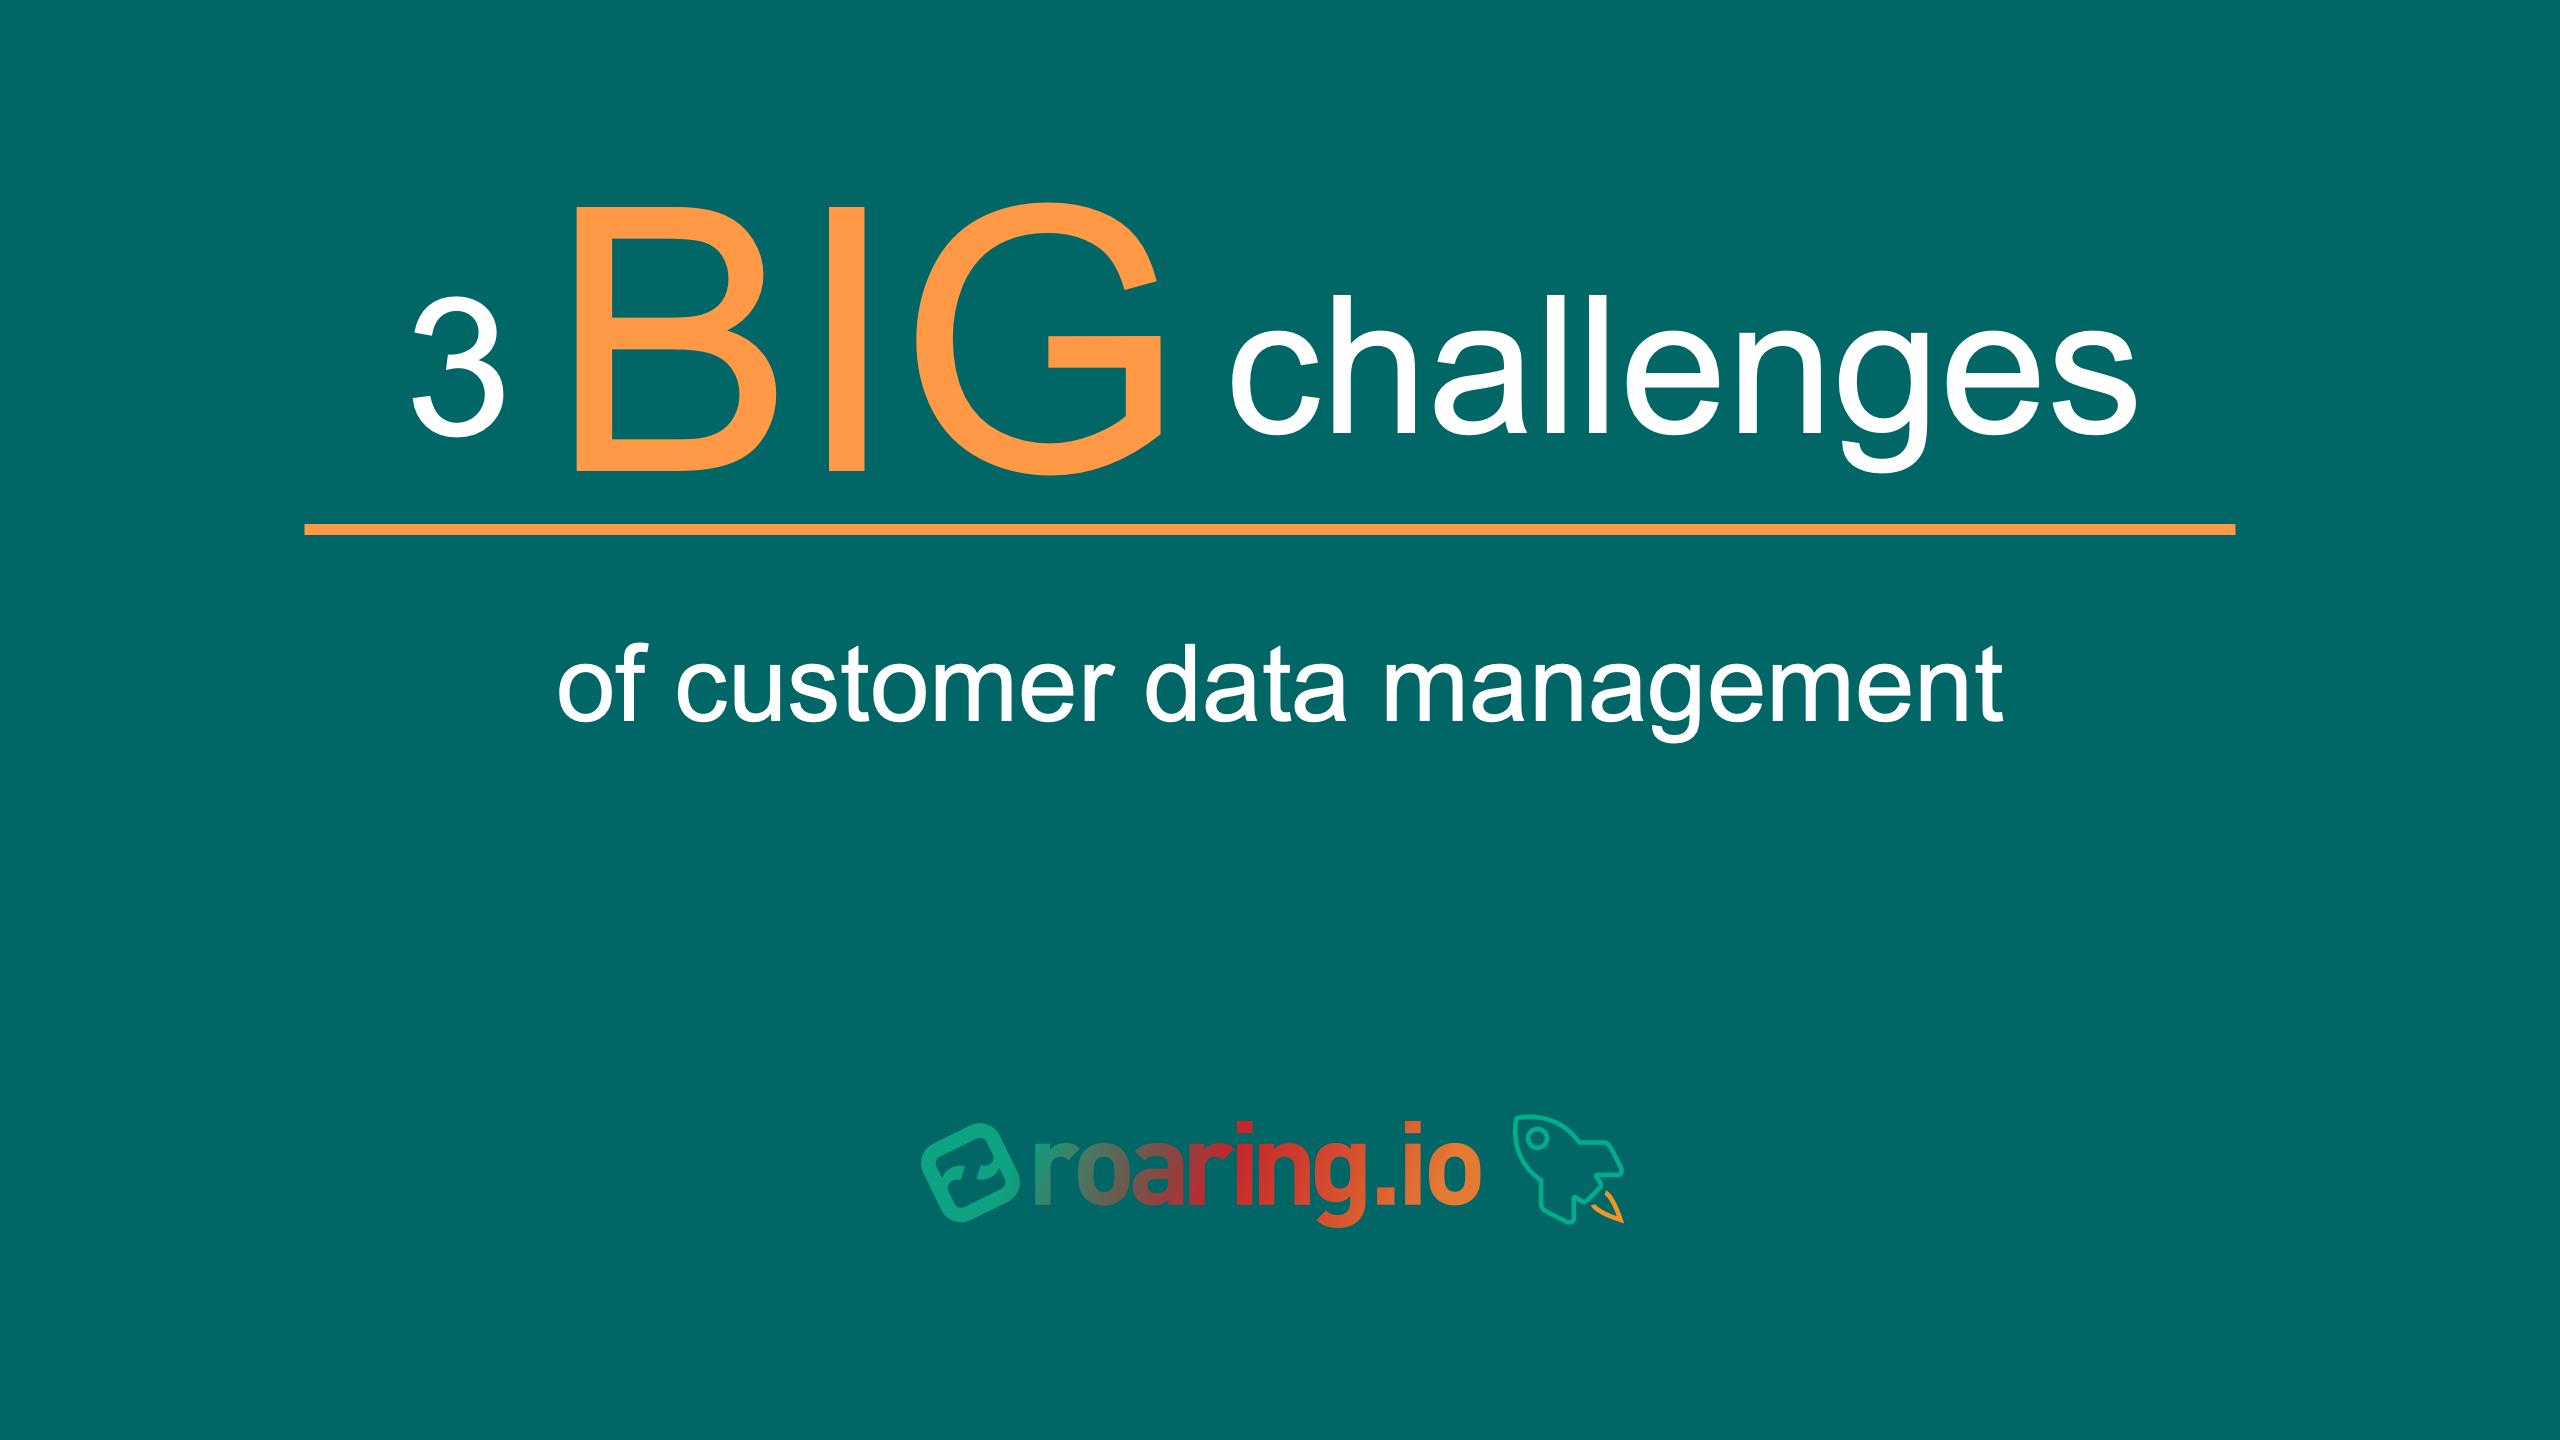 3 big challenges of customer data management